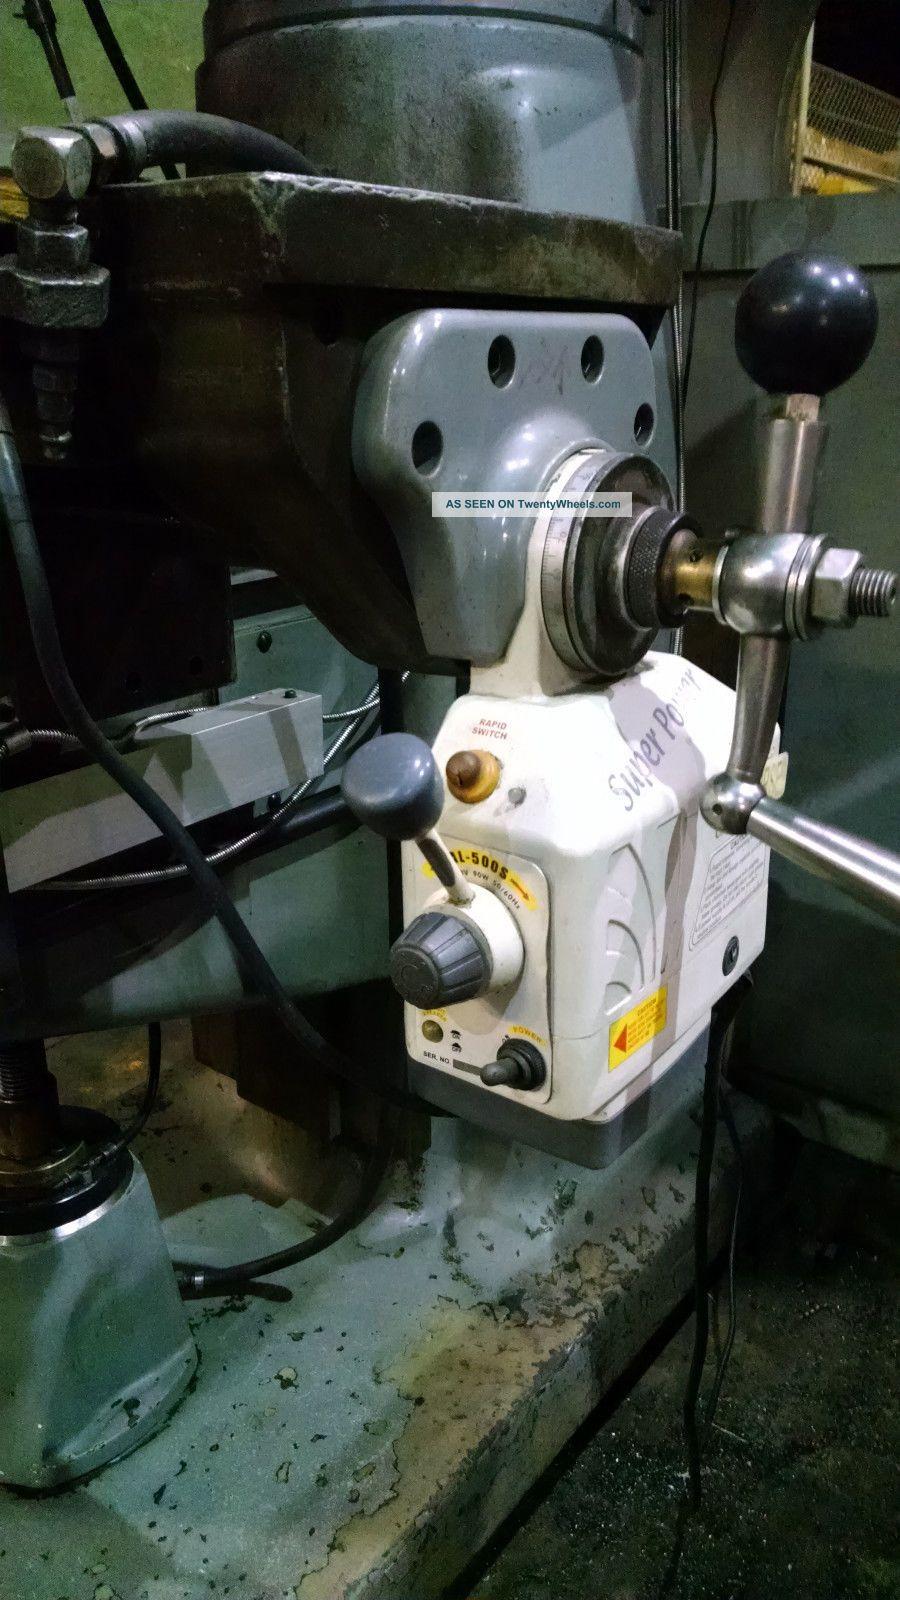 bridgeport series 2 milling machine